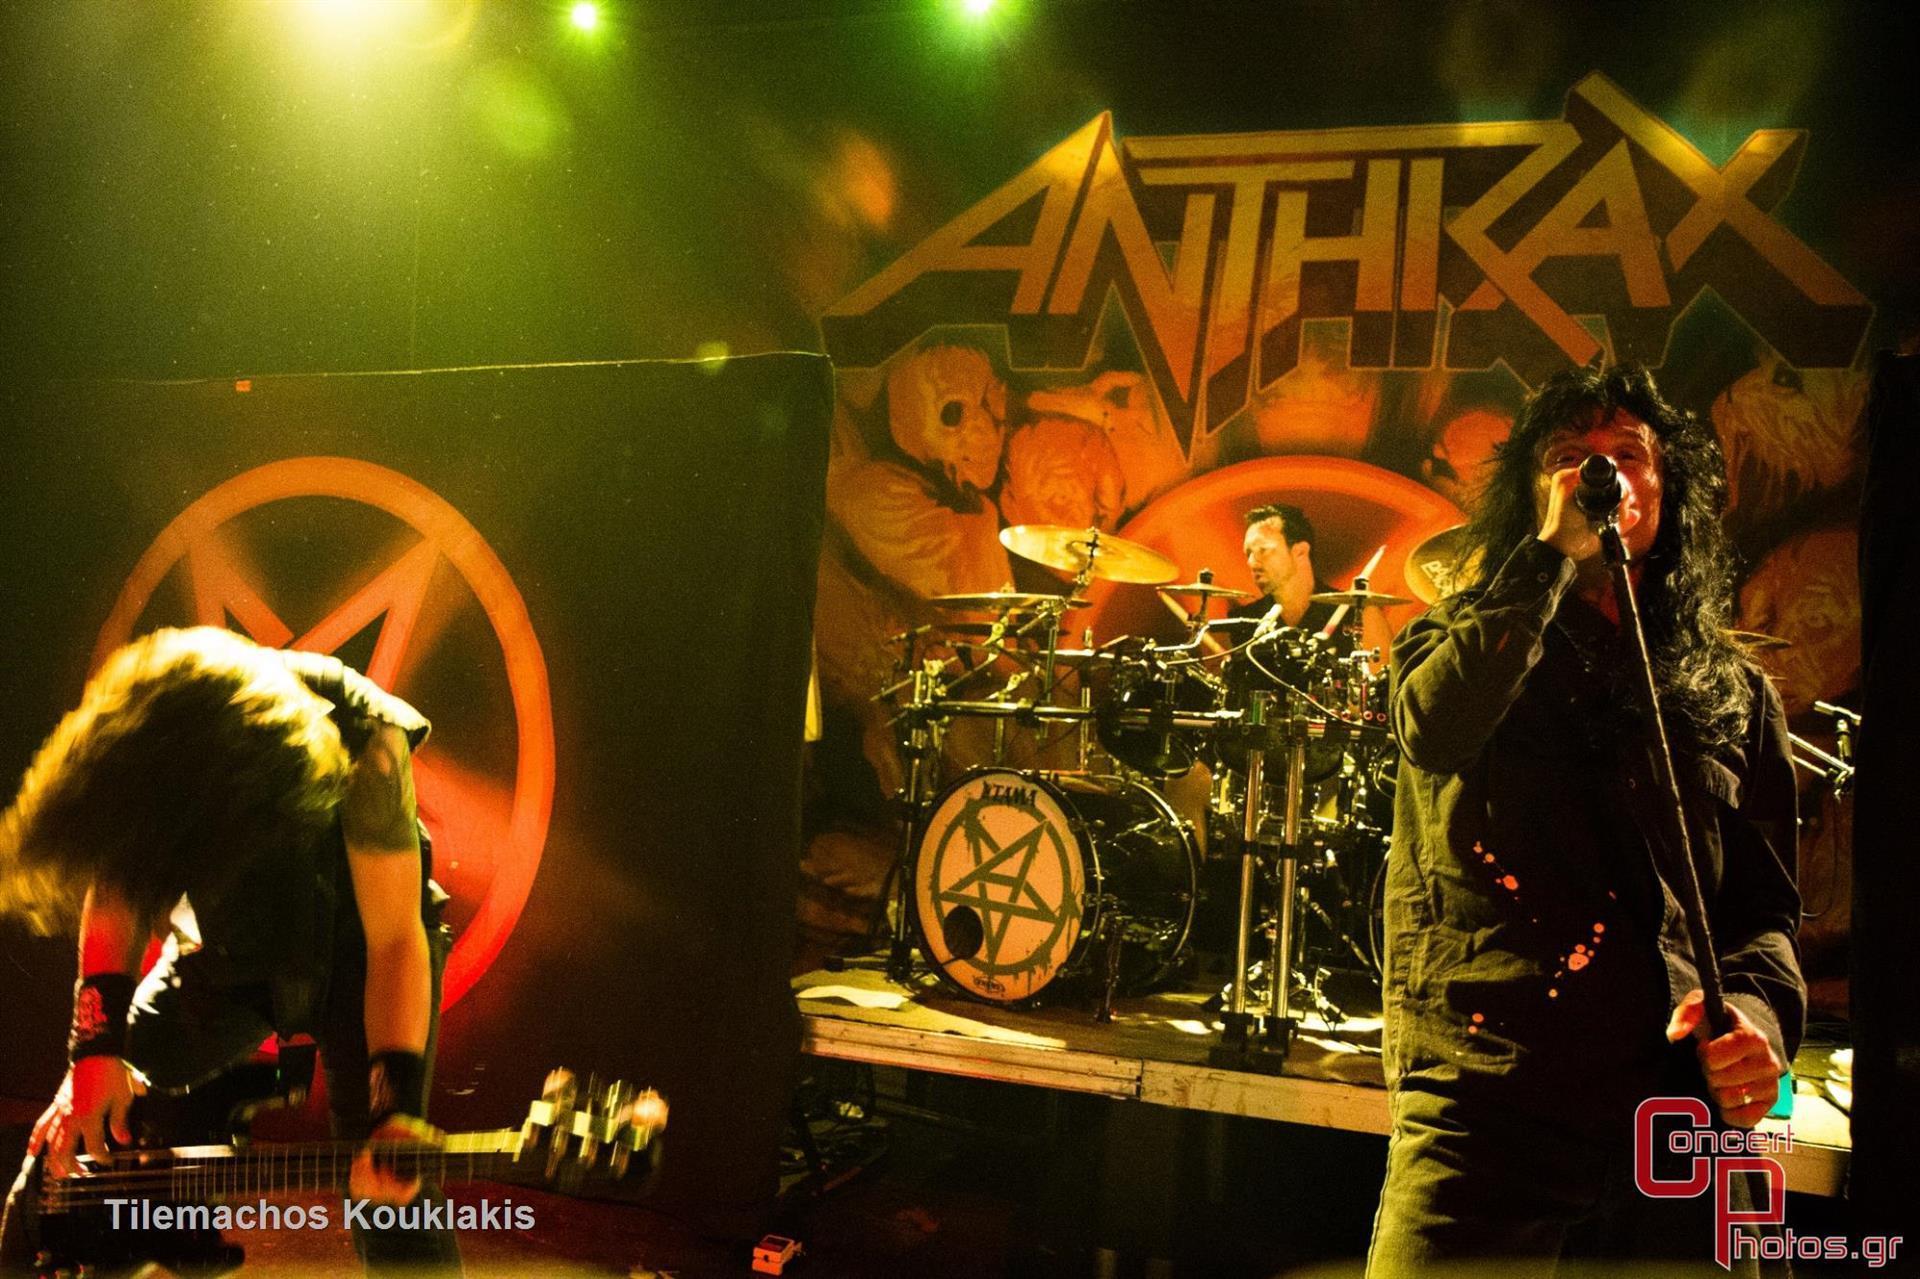 Anthrax-Anthrax photographer: Tilemachos Kouklakis - IMG_1441